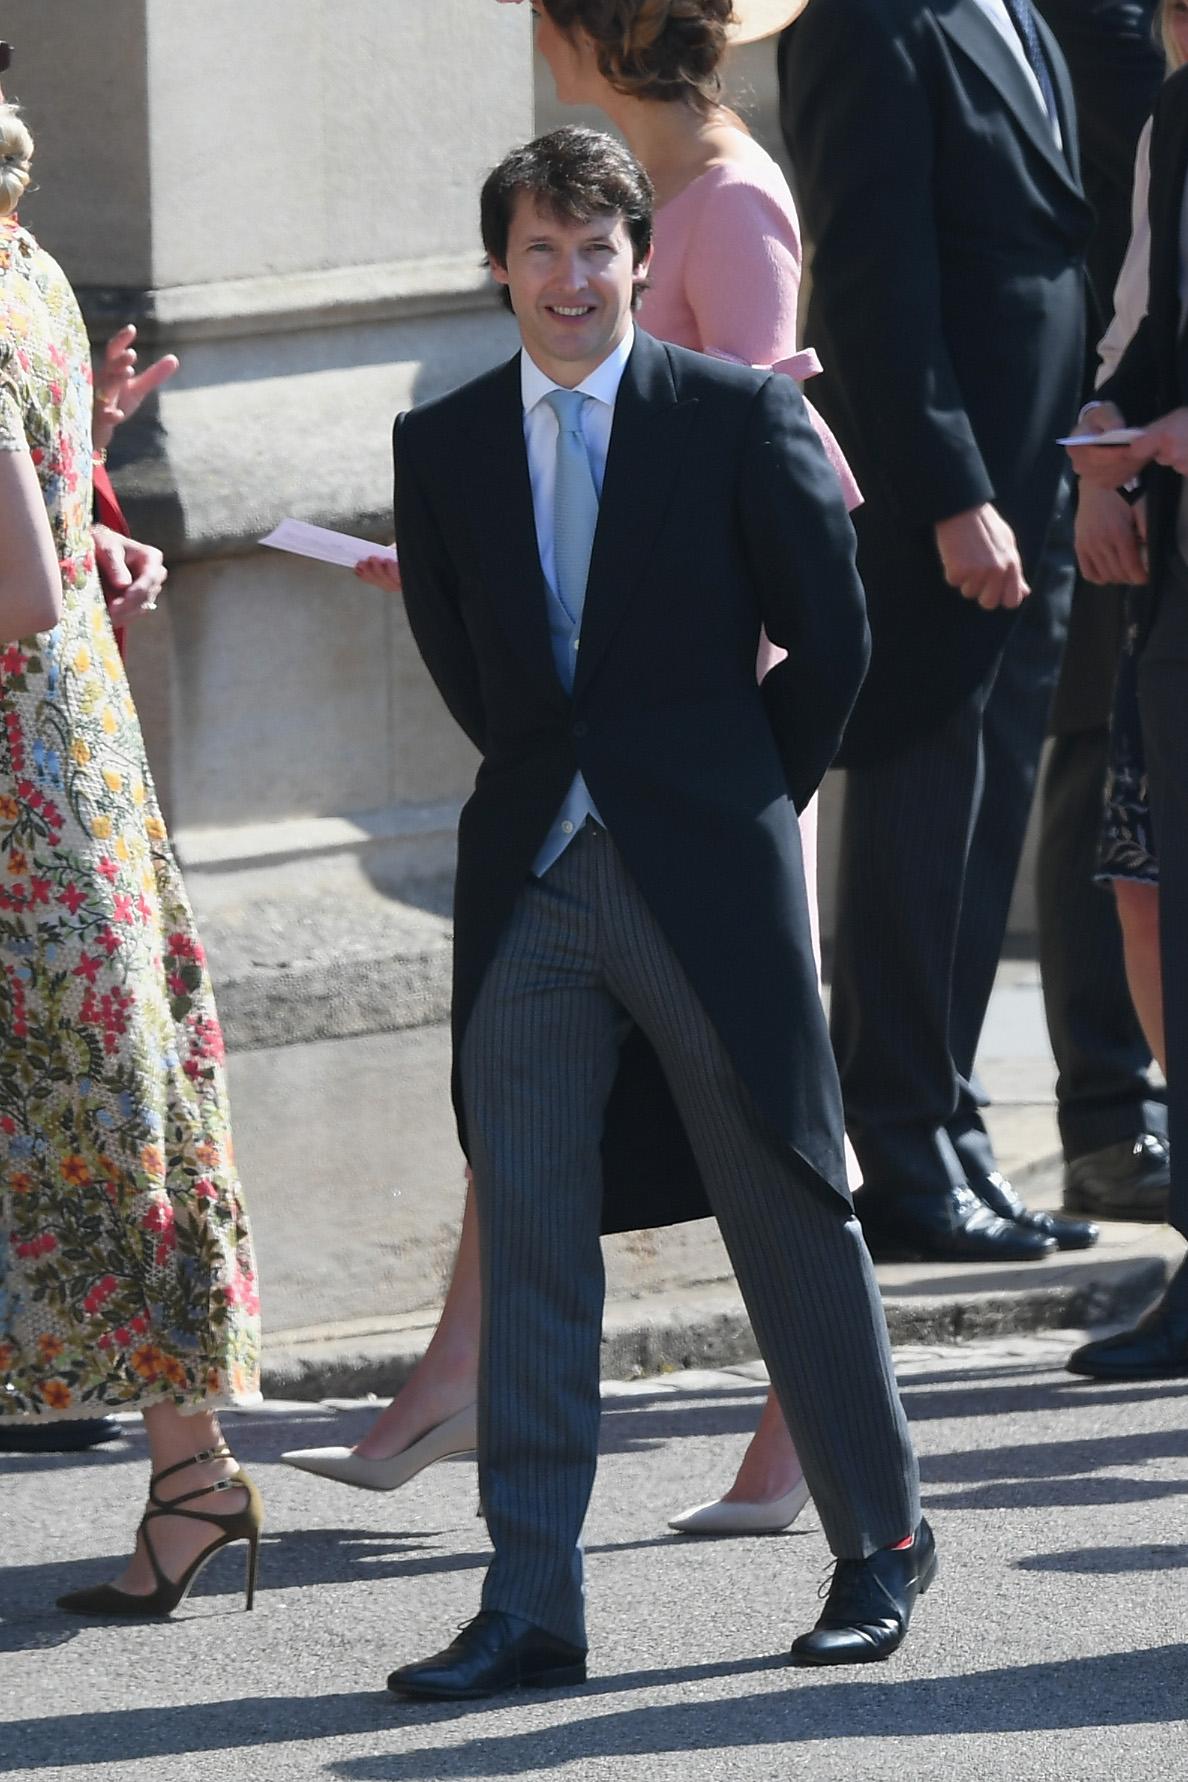 Hitkünstler James Blunt wurde vor der Kapelle gesichtet.  ©Getty Images